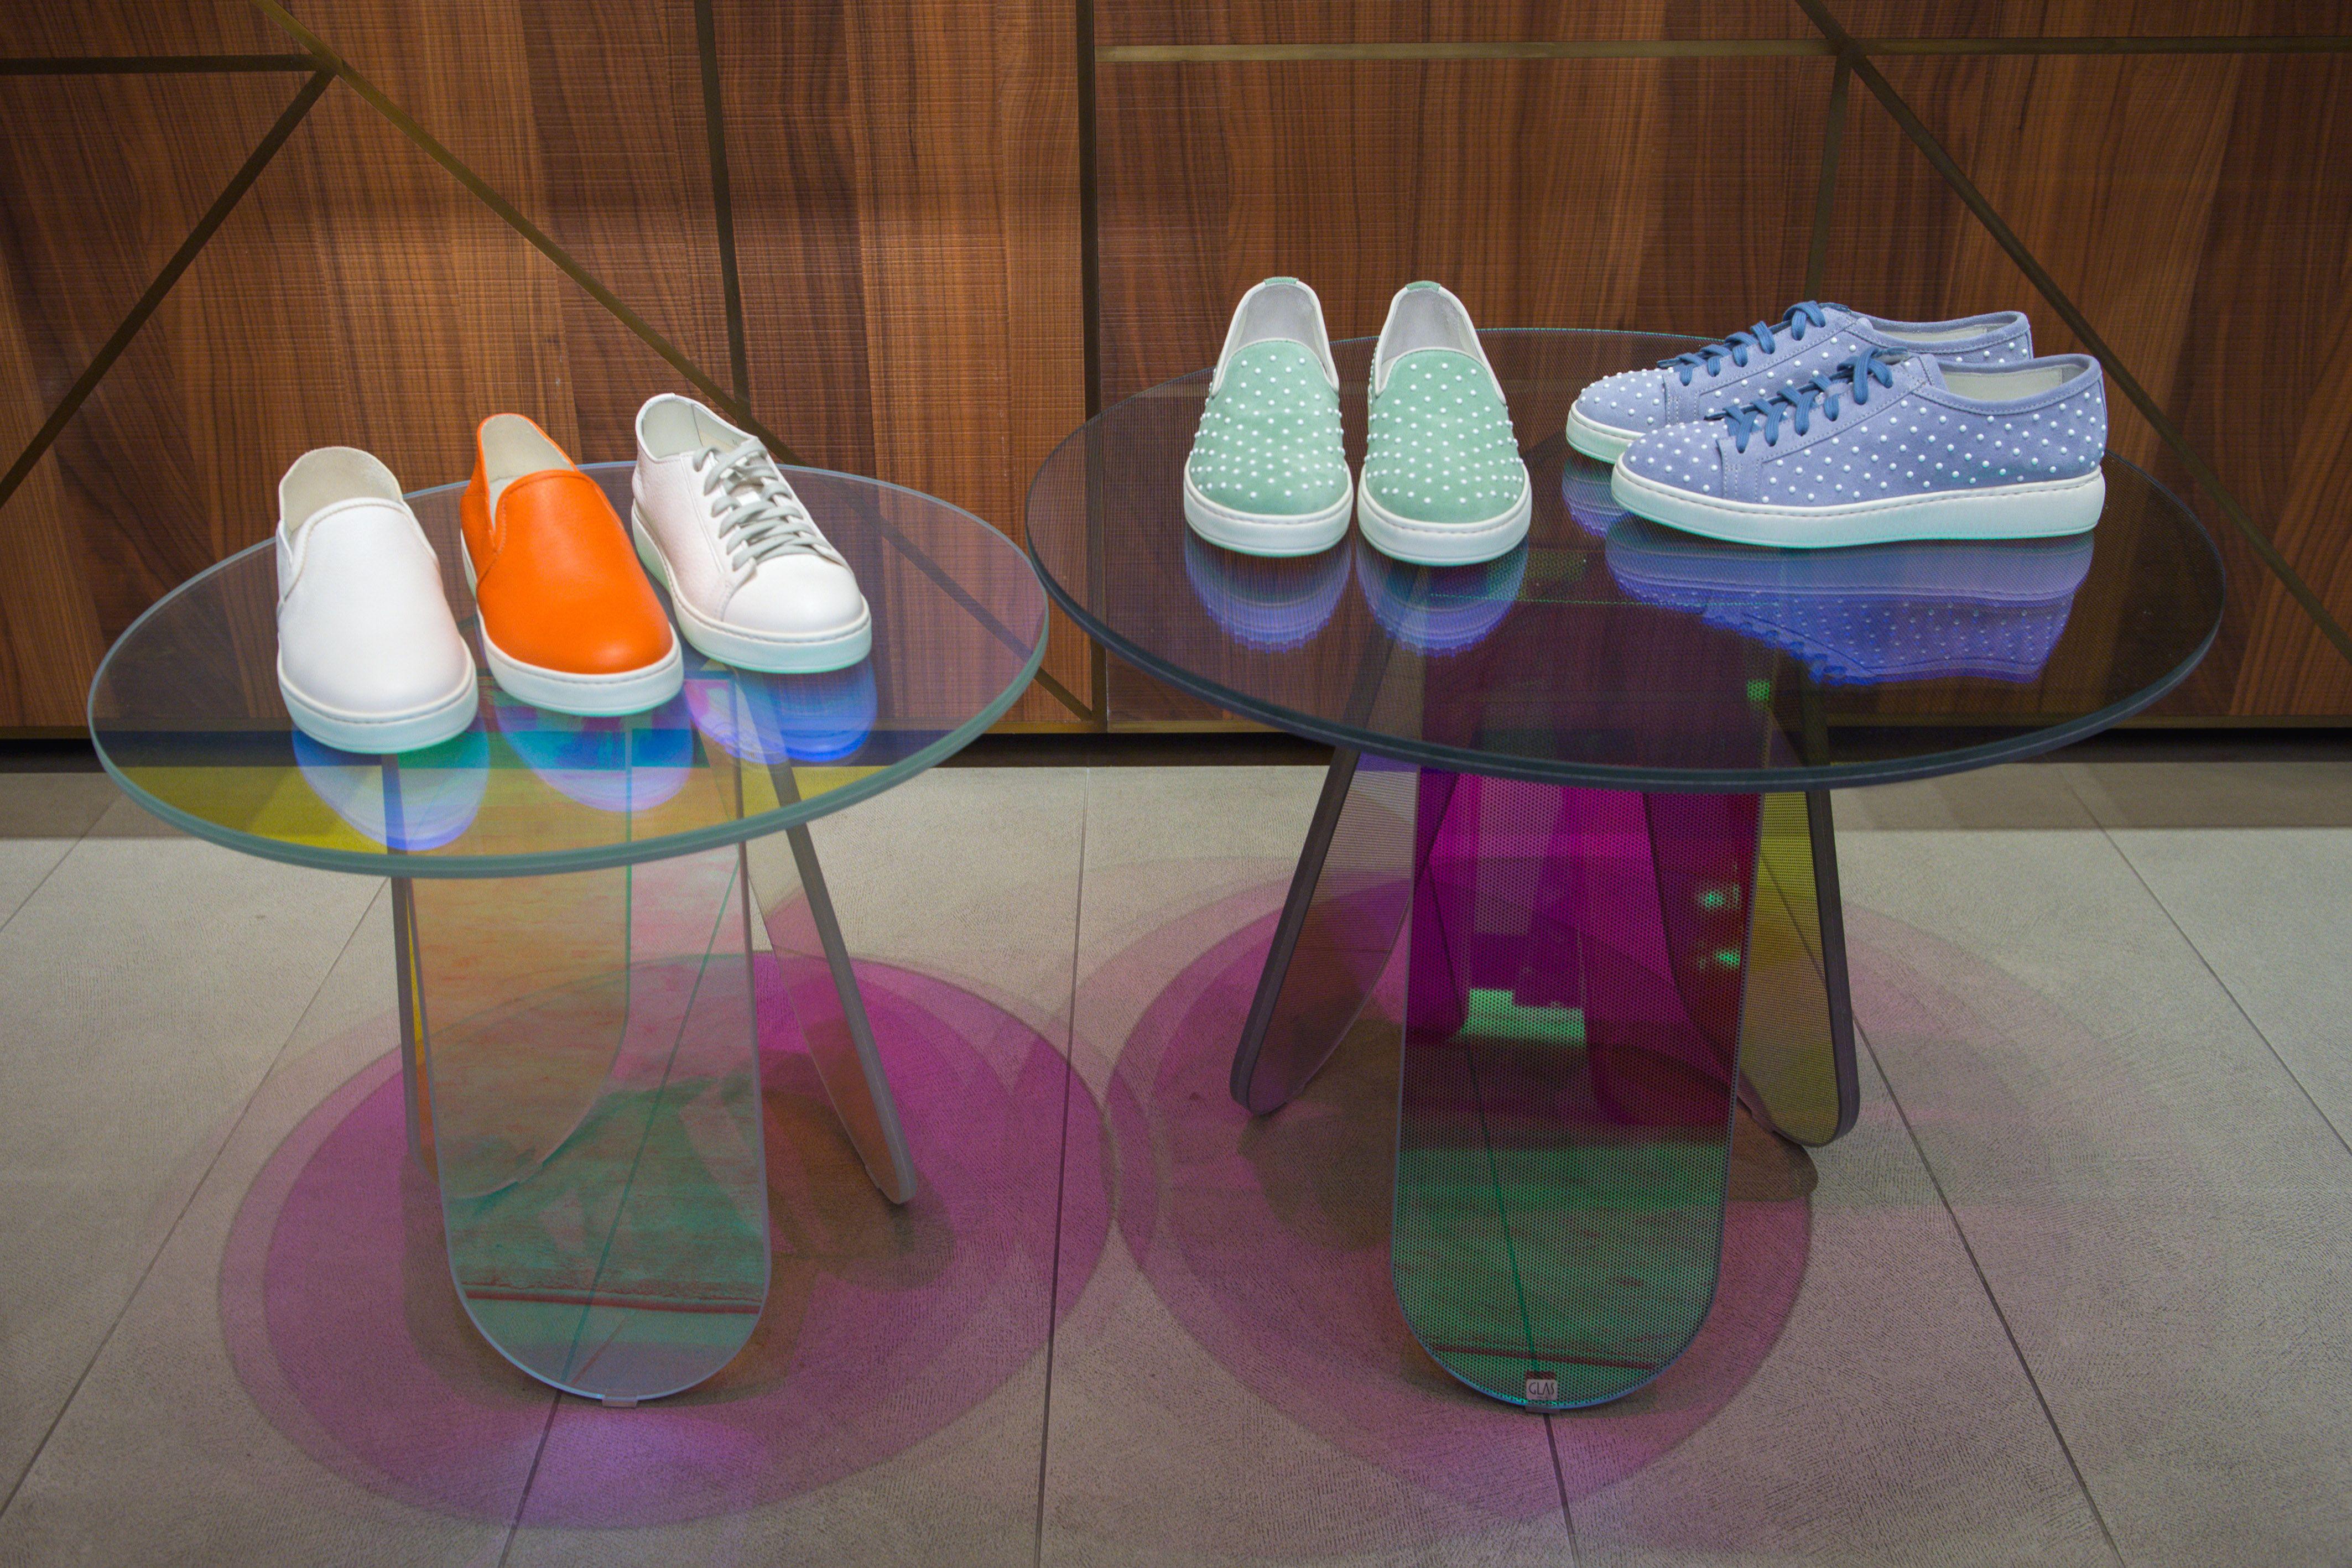 f0449d7aef2a7dc1bd58b6b172e3de97 Incroyable De Table Basse Le Corbusier Concept